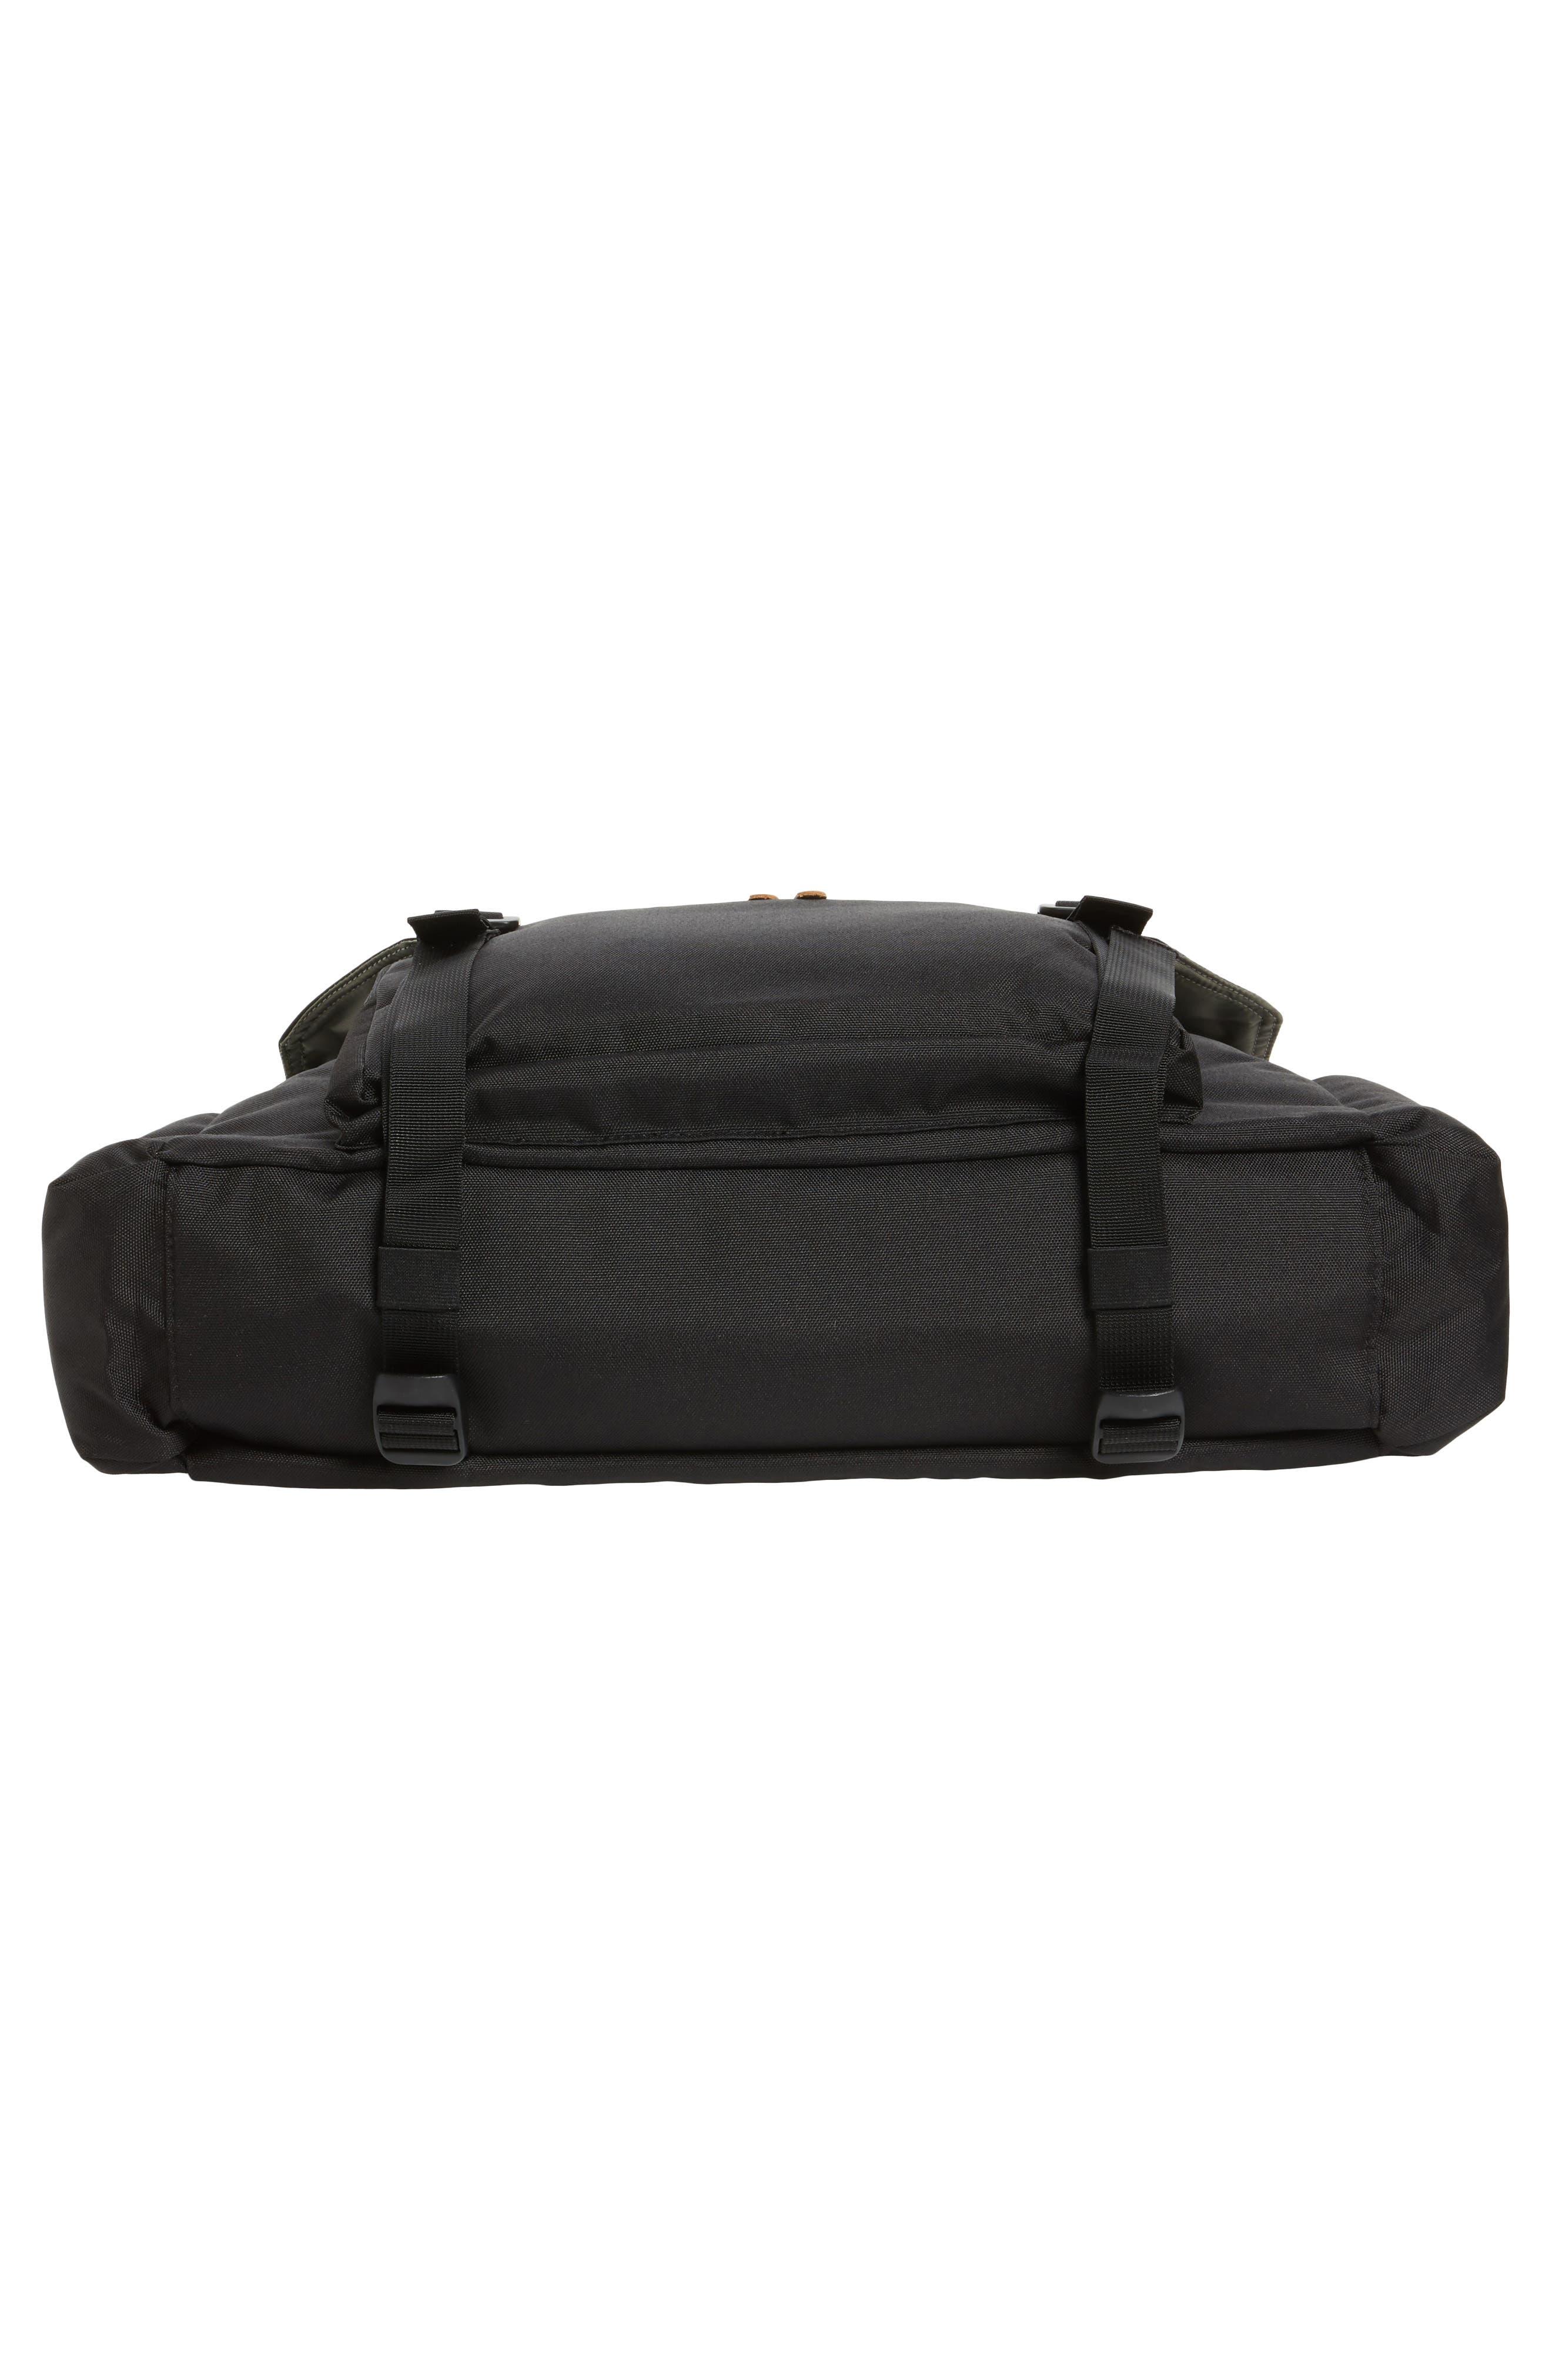 Crossridge Messenger Bag,                             Alternate thumbnail 6, color,                             Black